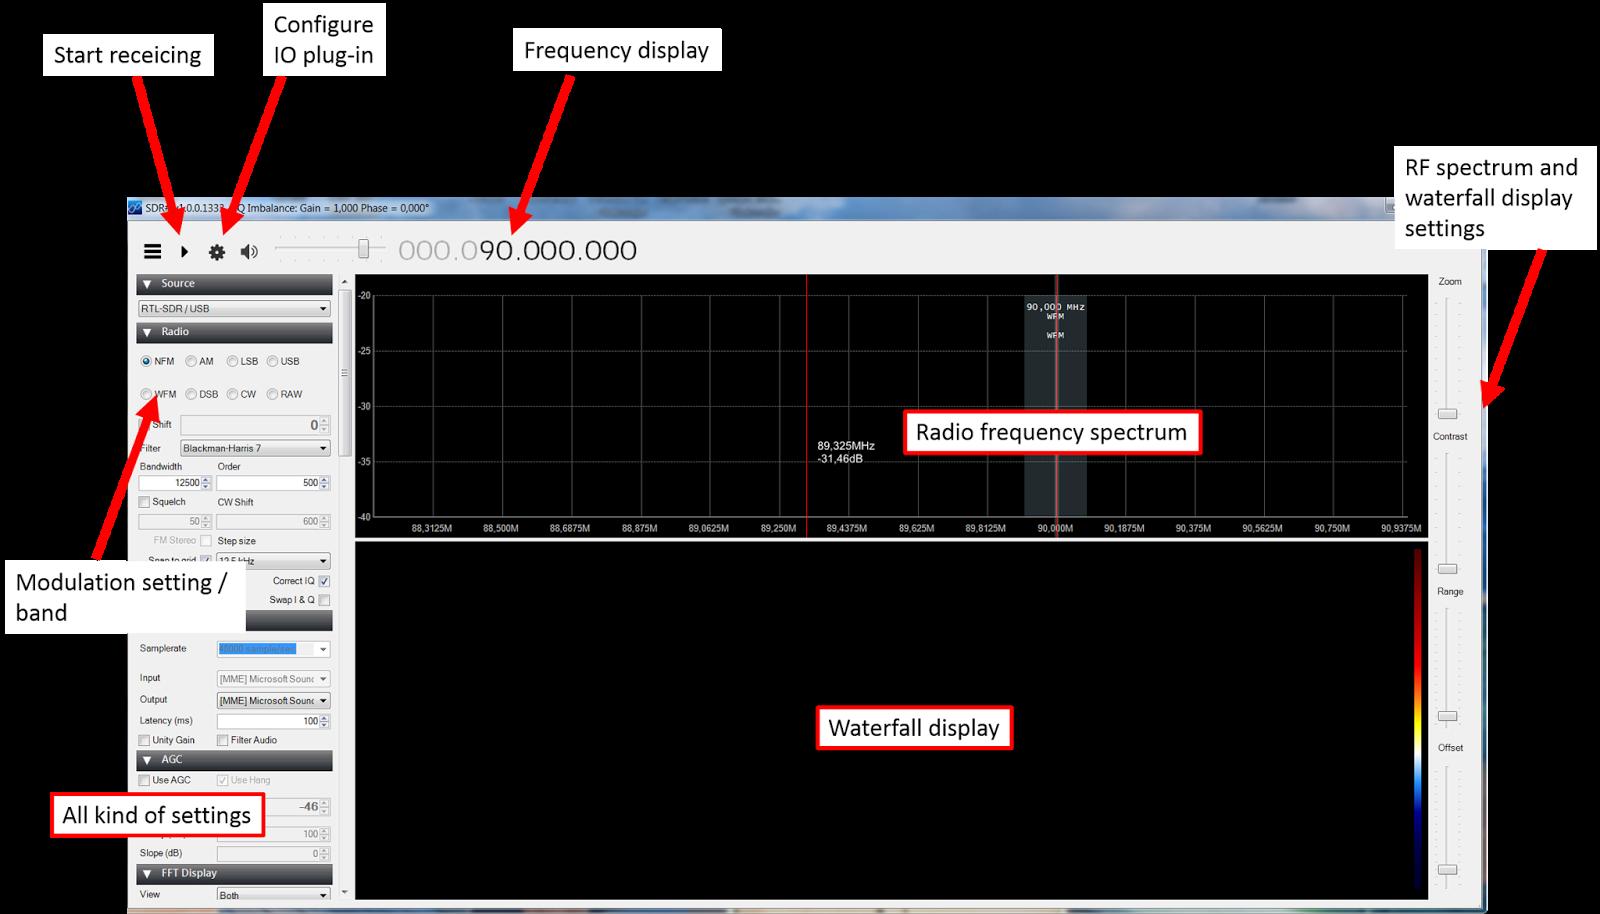 Verstas 2010+: Software defined radio 3/4  SDR software for windows